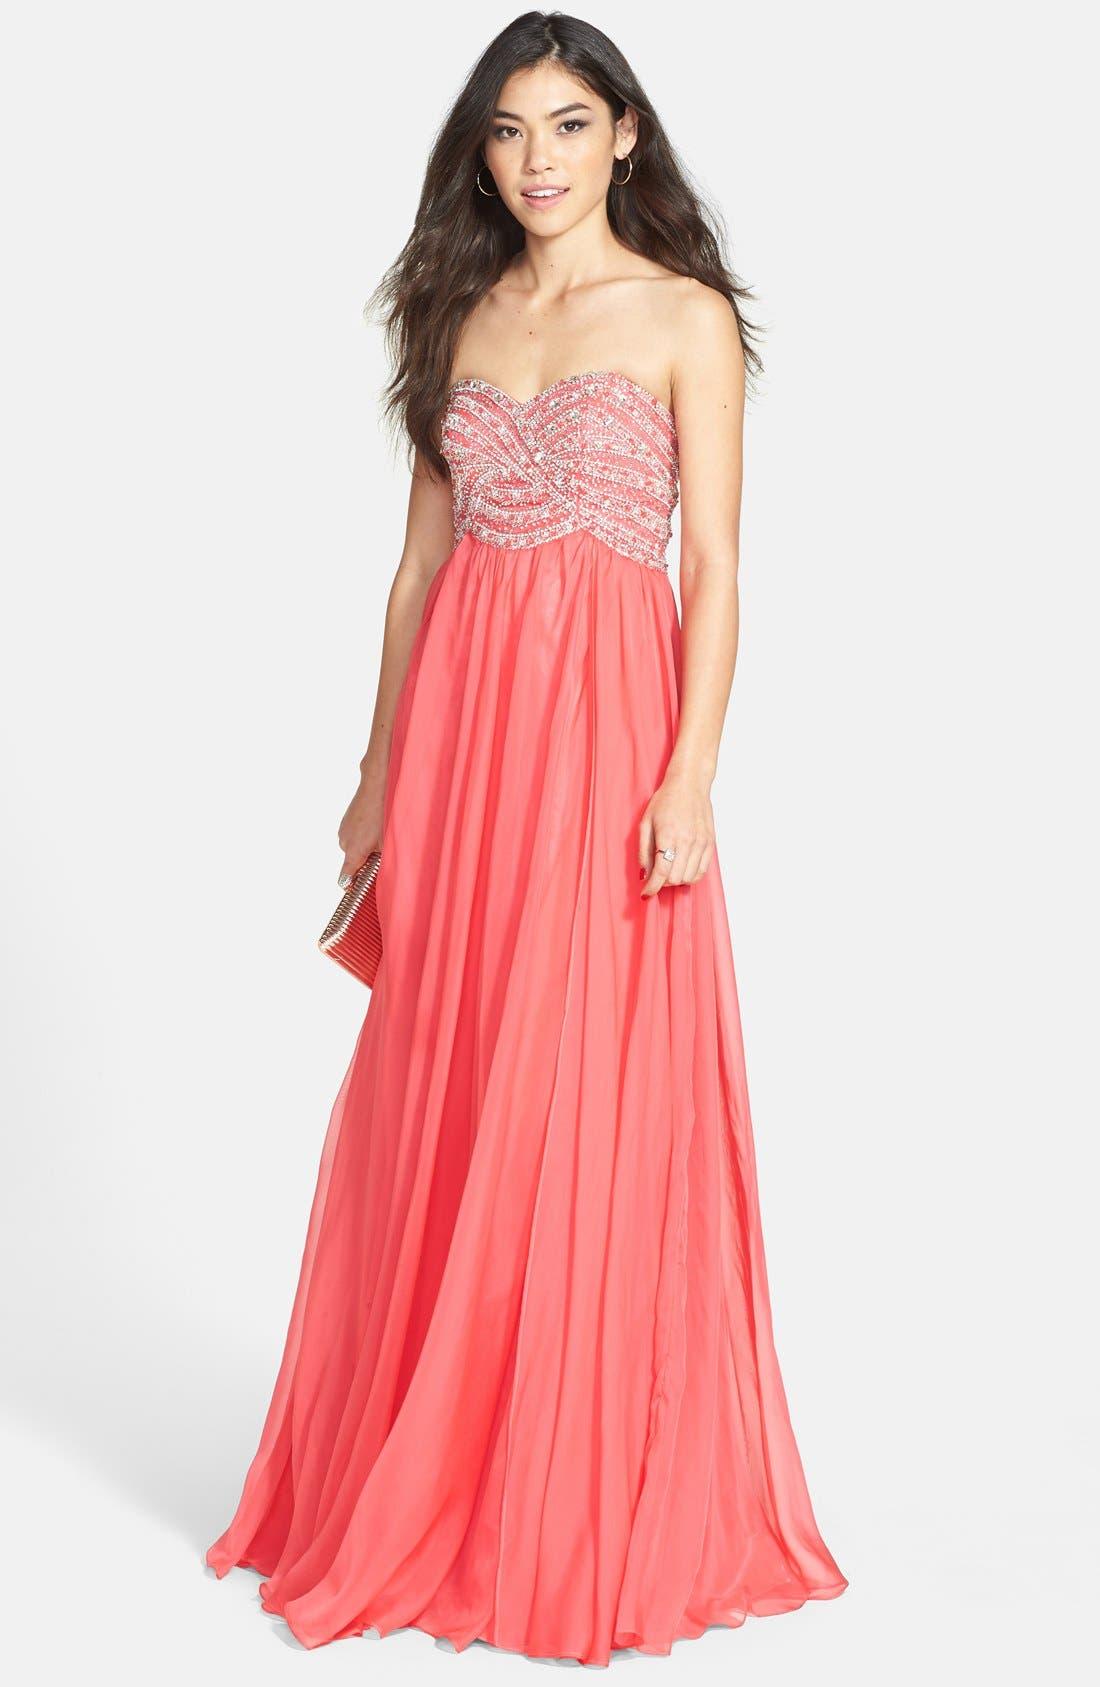 Alternate Image 1 Selected - Sherri Hill Embellished Bodice Chiffon Gown